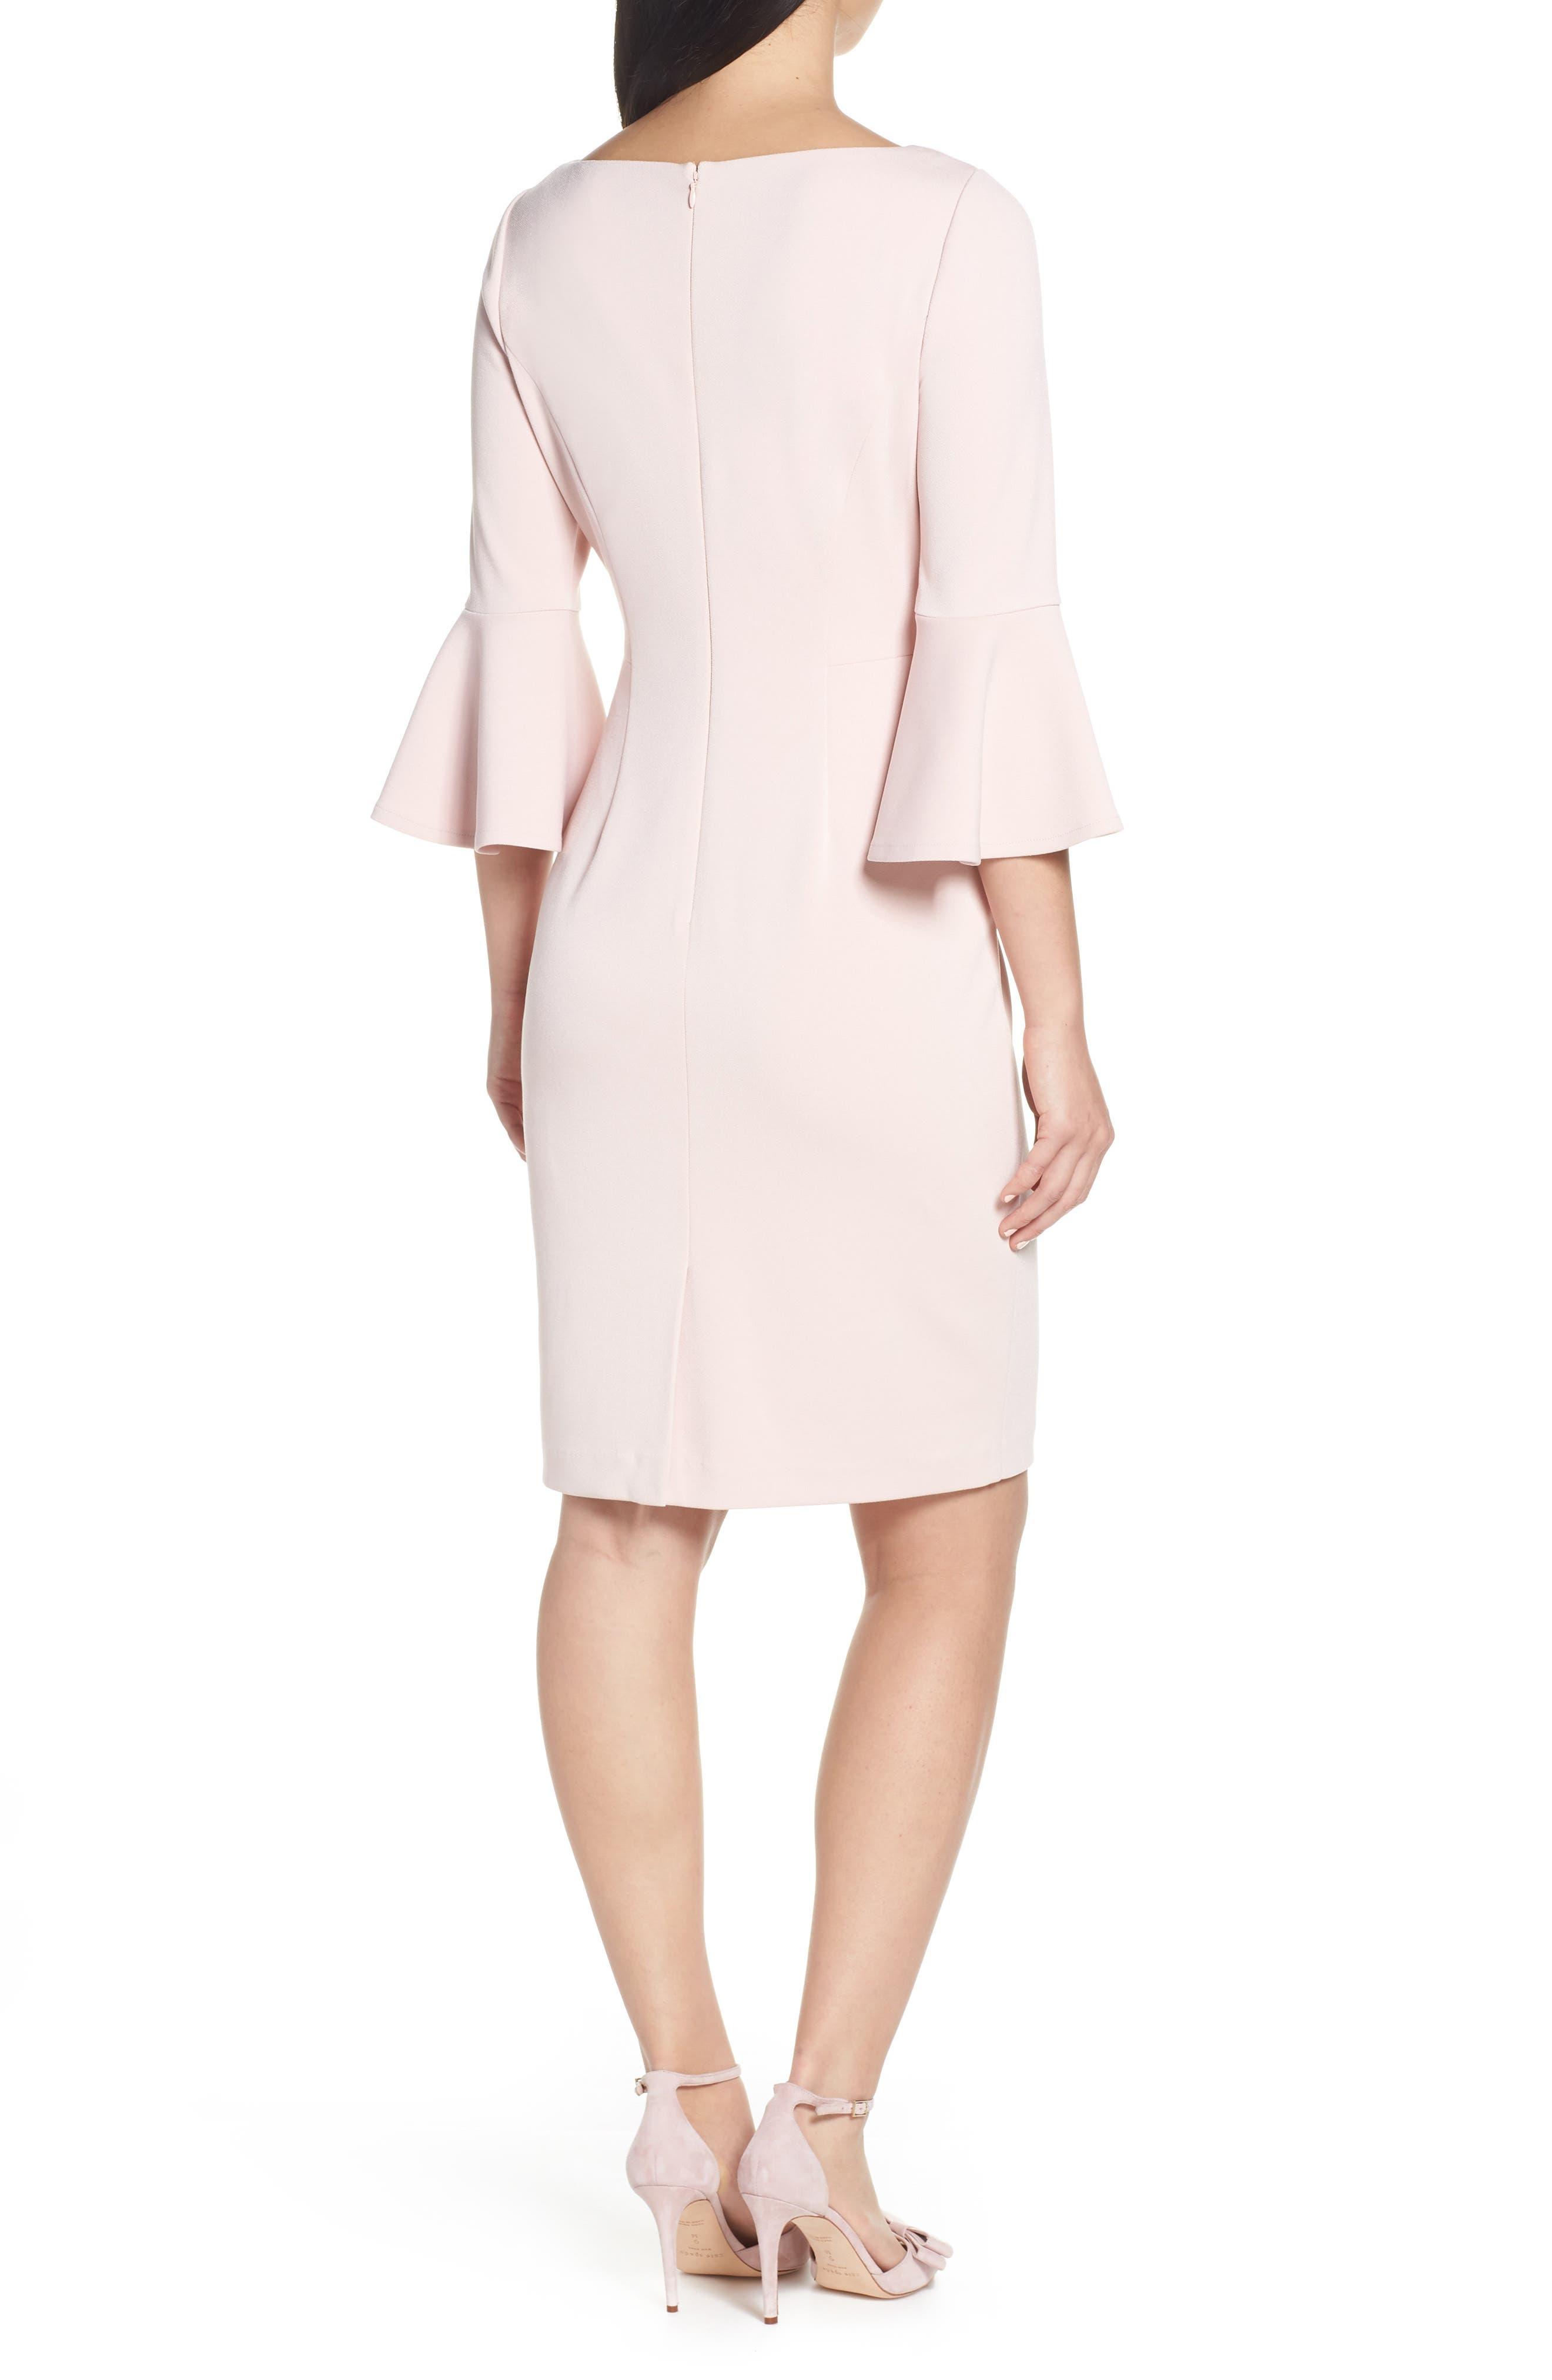 HARPER ROSE, Bell Sleeve Bateau Neck Sheath Dress, Alternate thumbnail 2, color, BLUSH